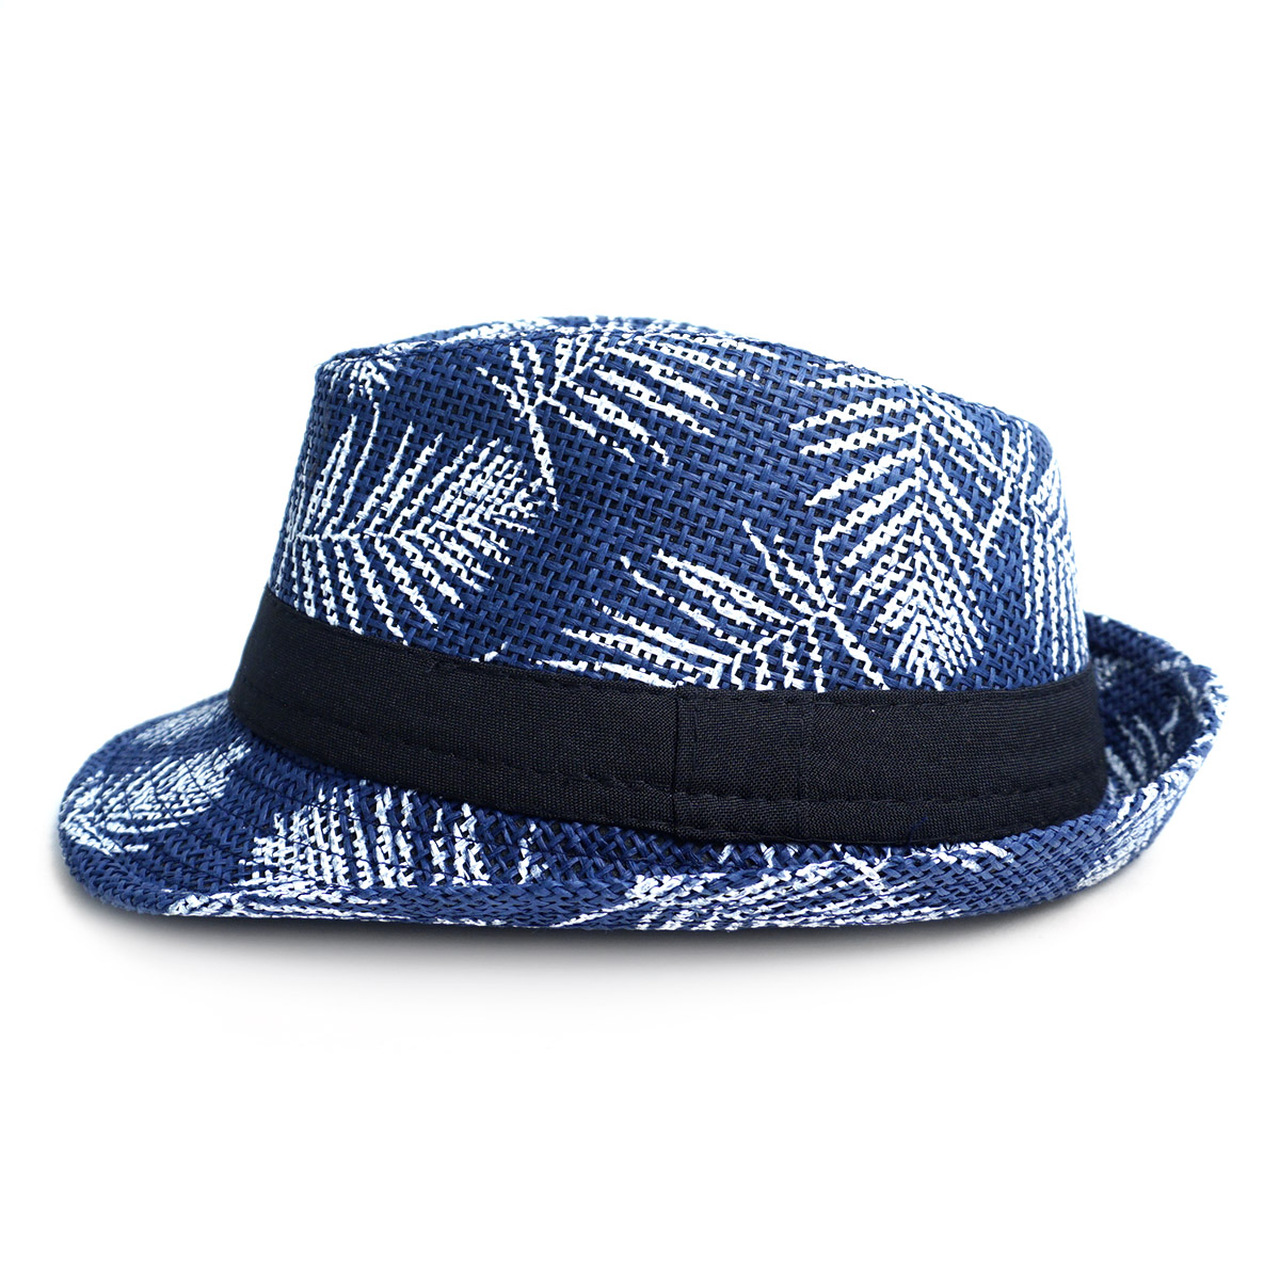 Tropical Palm Leaves Kid s Fedora Hat - BF180600 7bdf9d14195